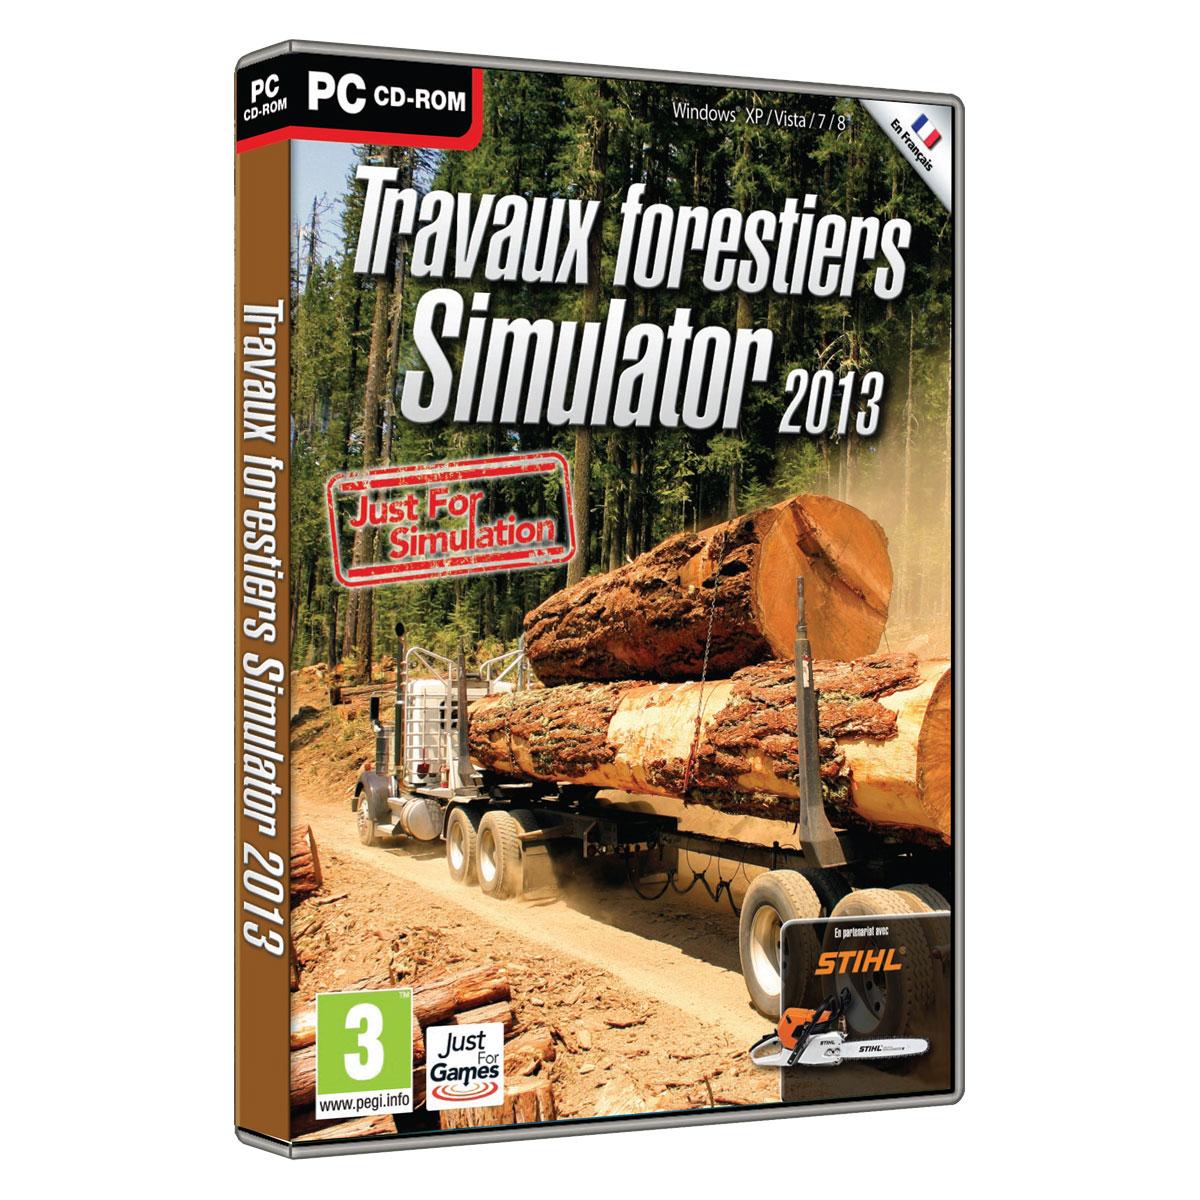 travaux forestiers simulator 2013 pc jeux pc just for games sur. Black Bedroom Furniture Sets. Home Design Ideas